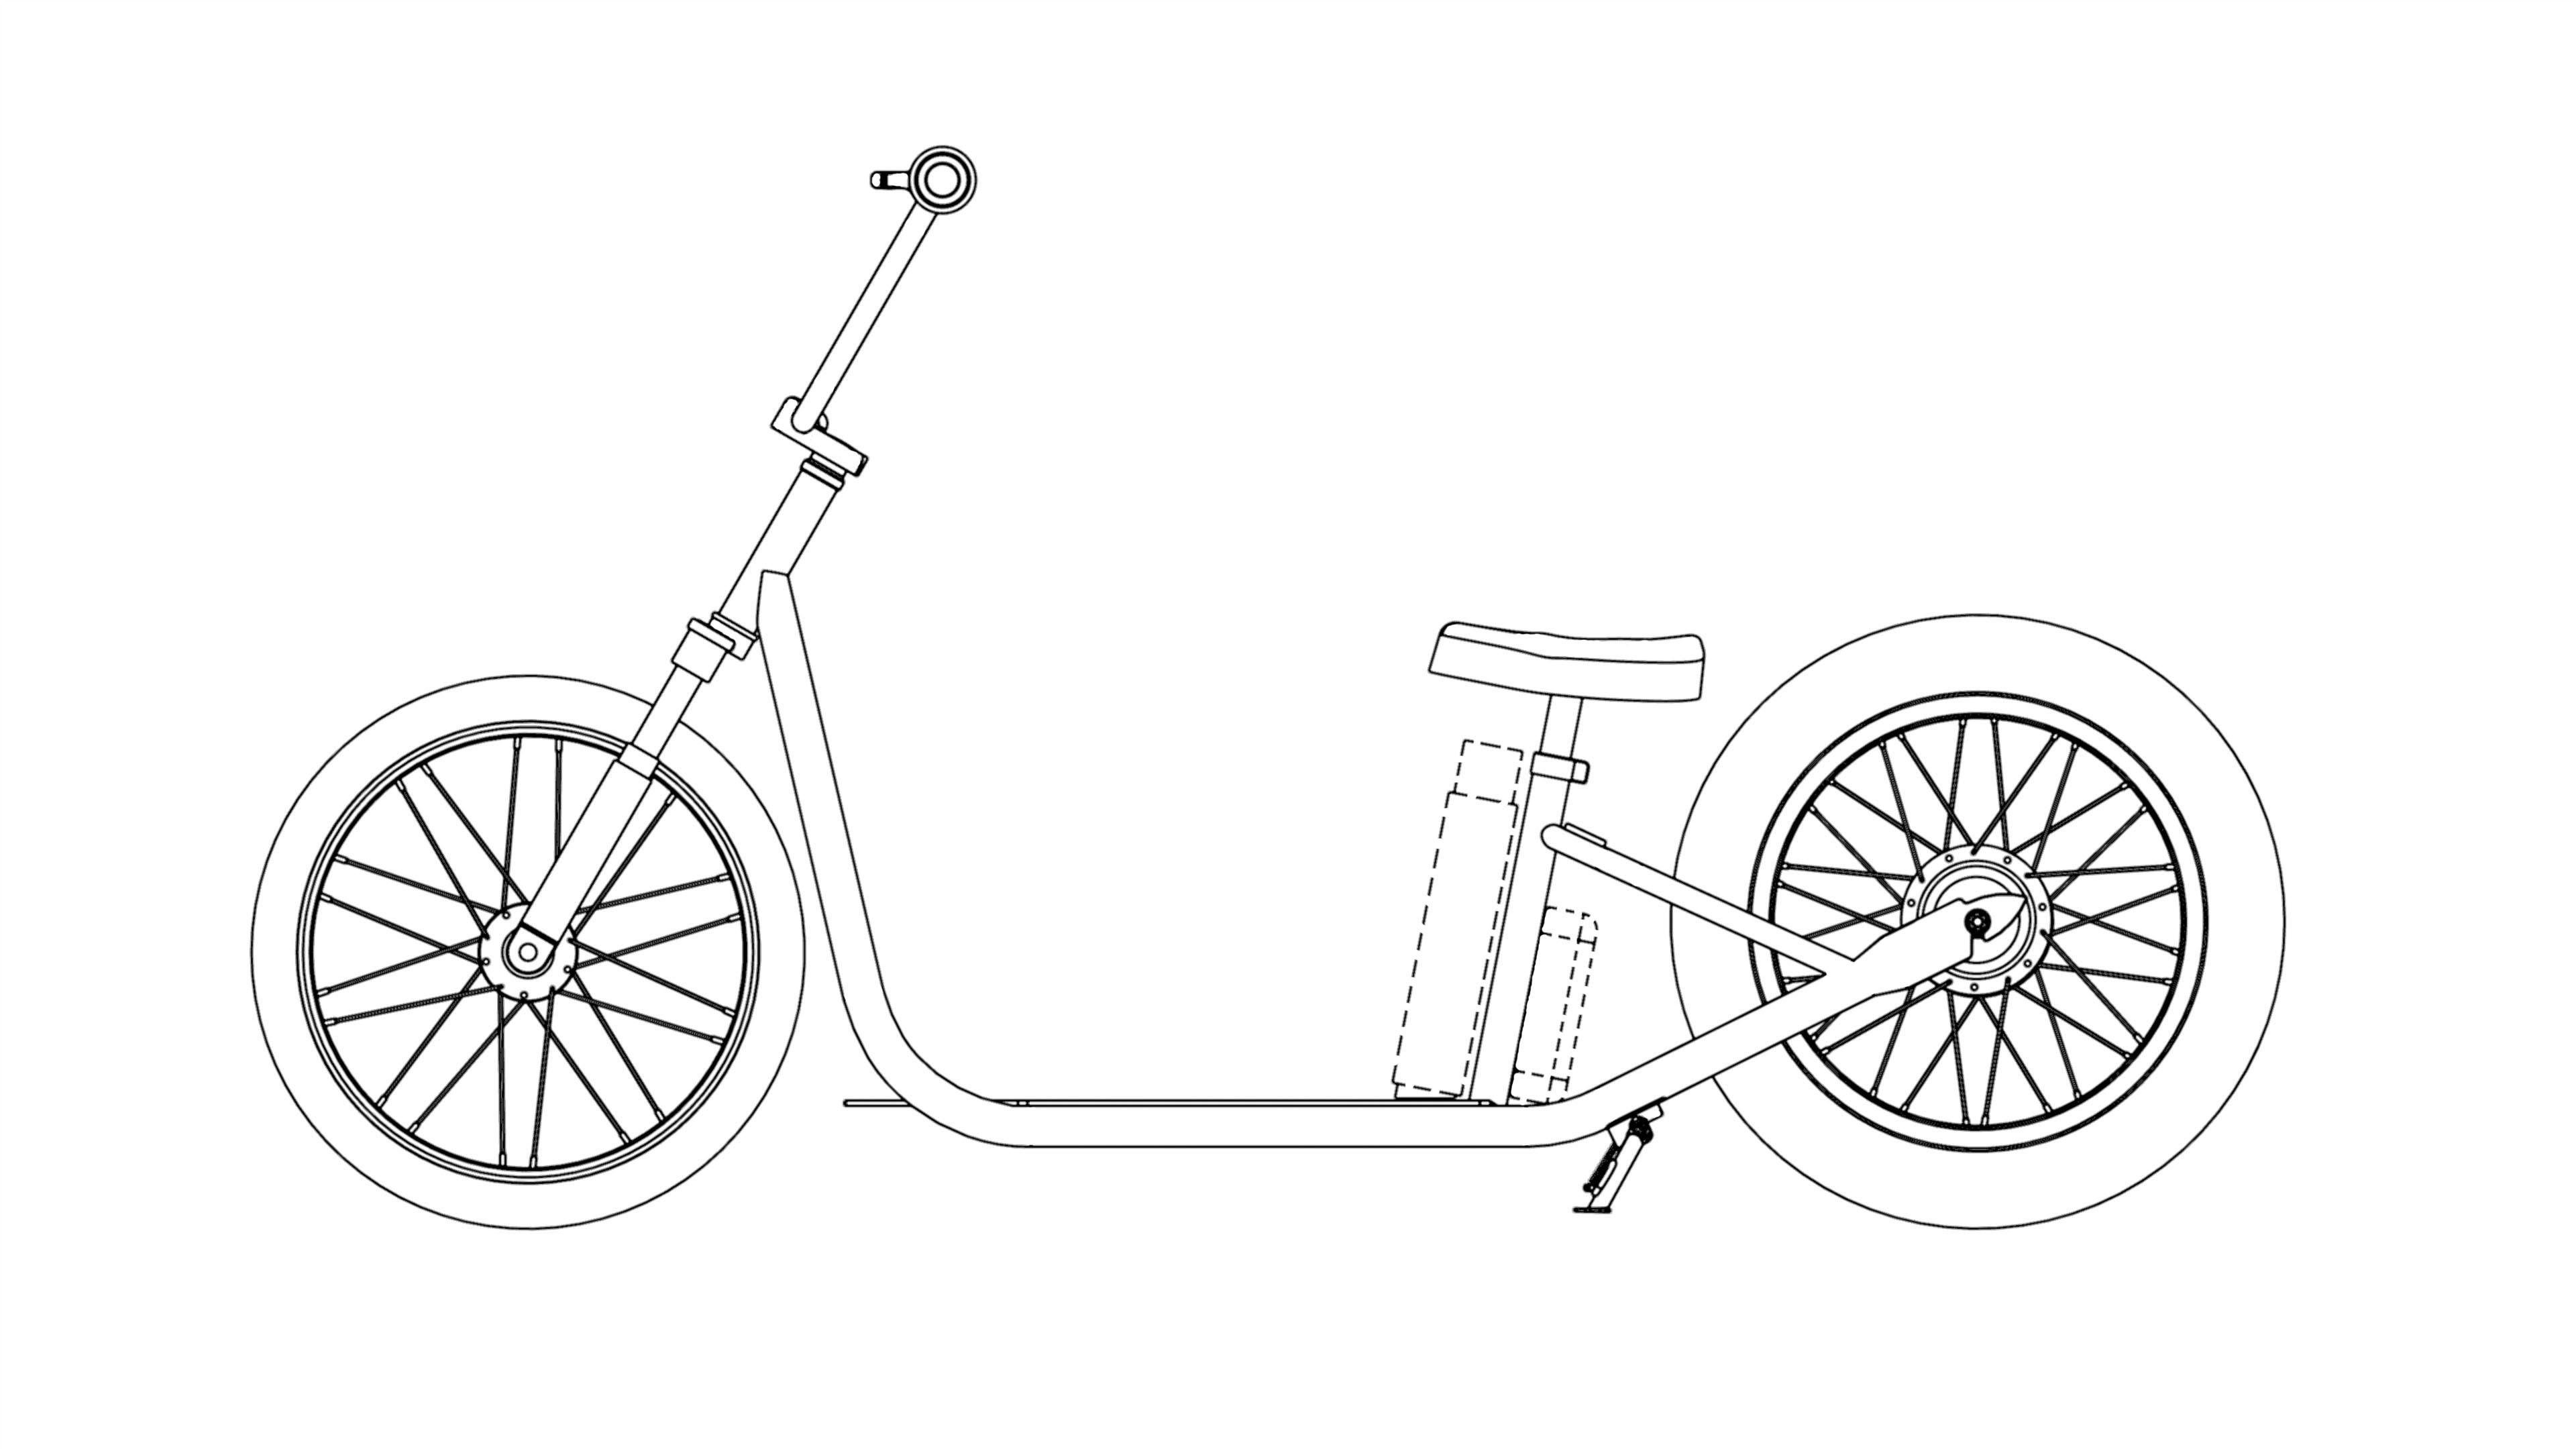 Подготовка электосамоката к патенту по заказу